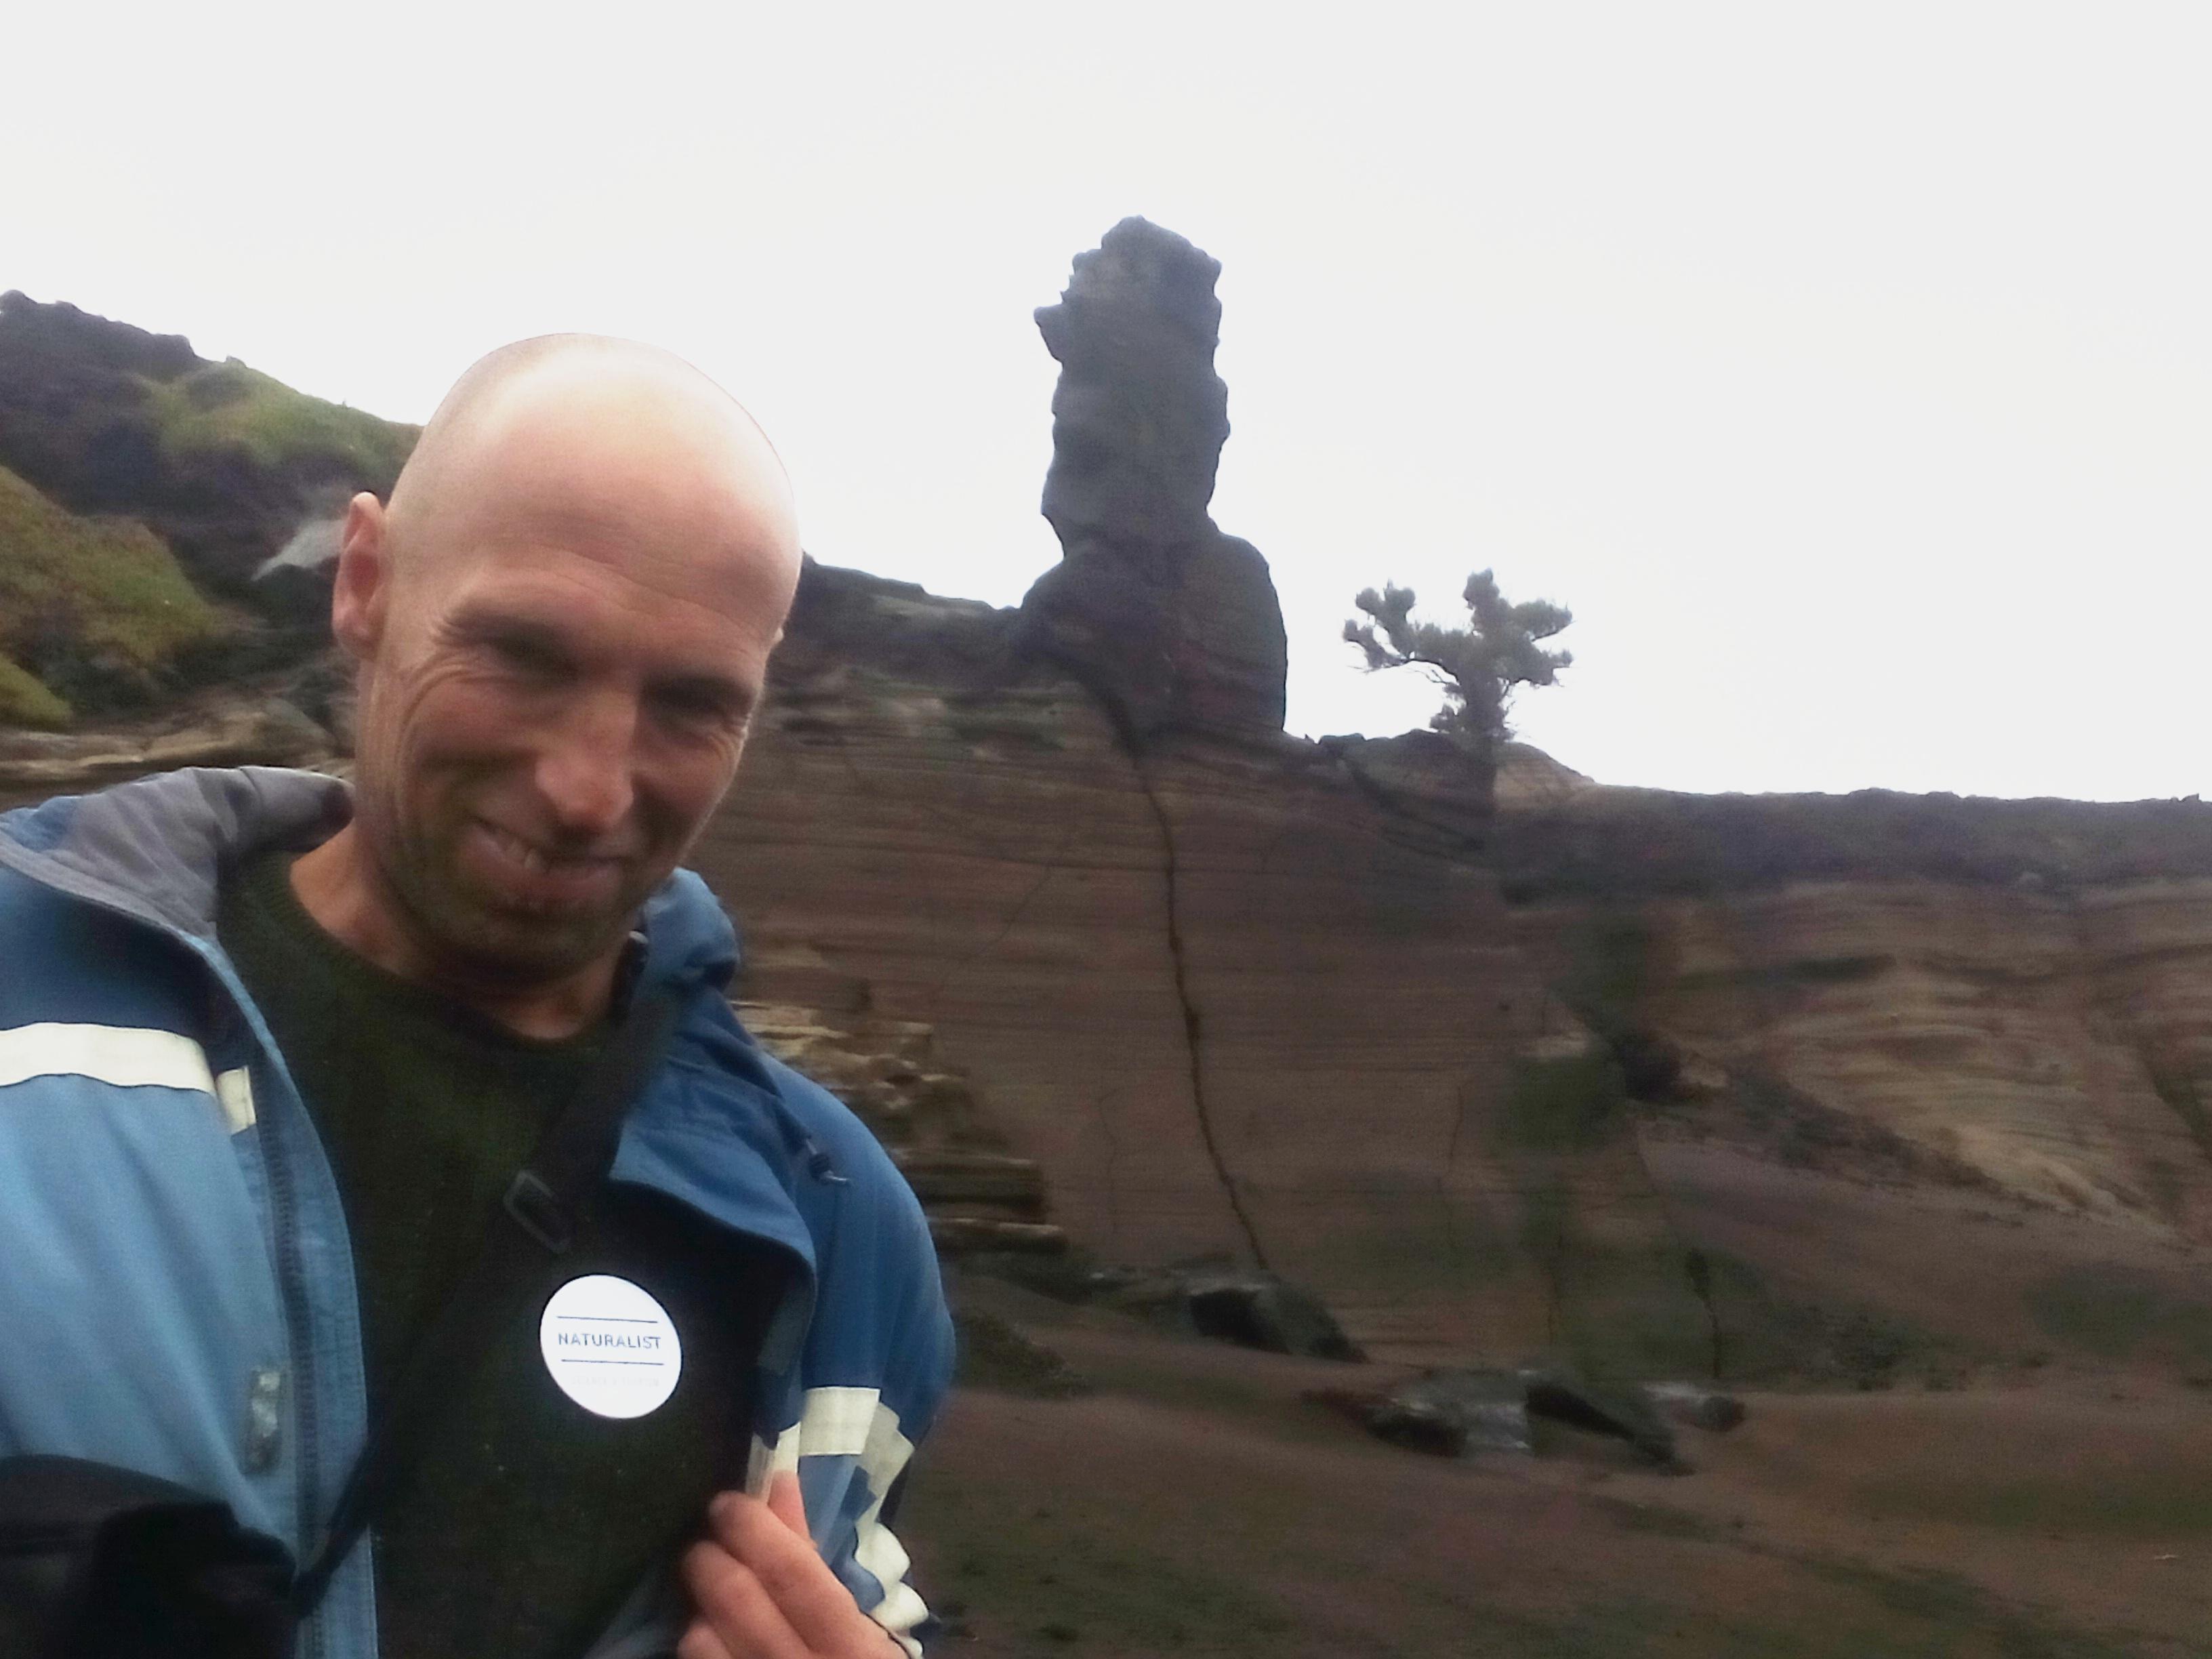 Jonathan Biddle - Ornithologist